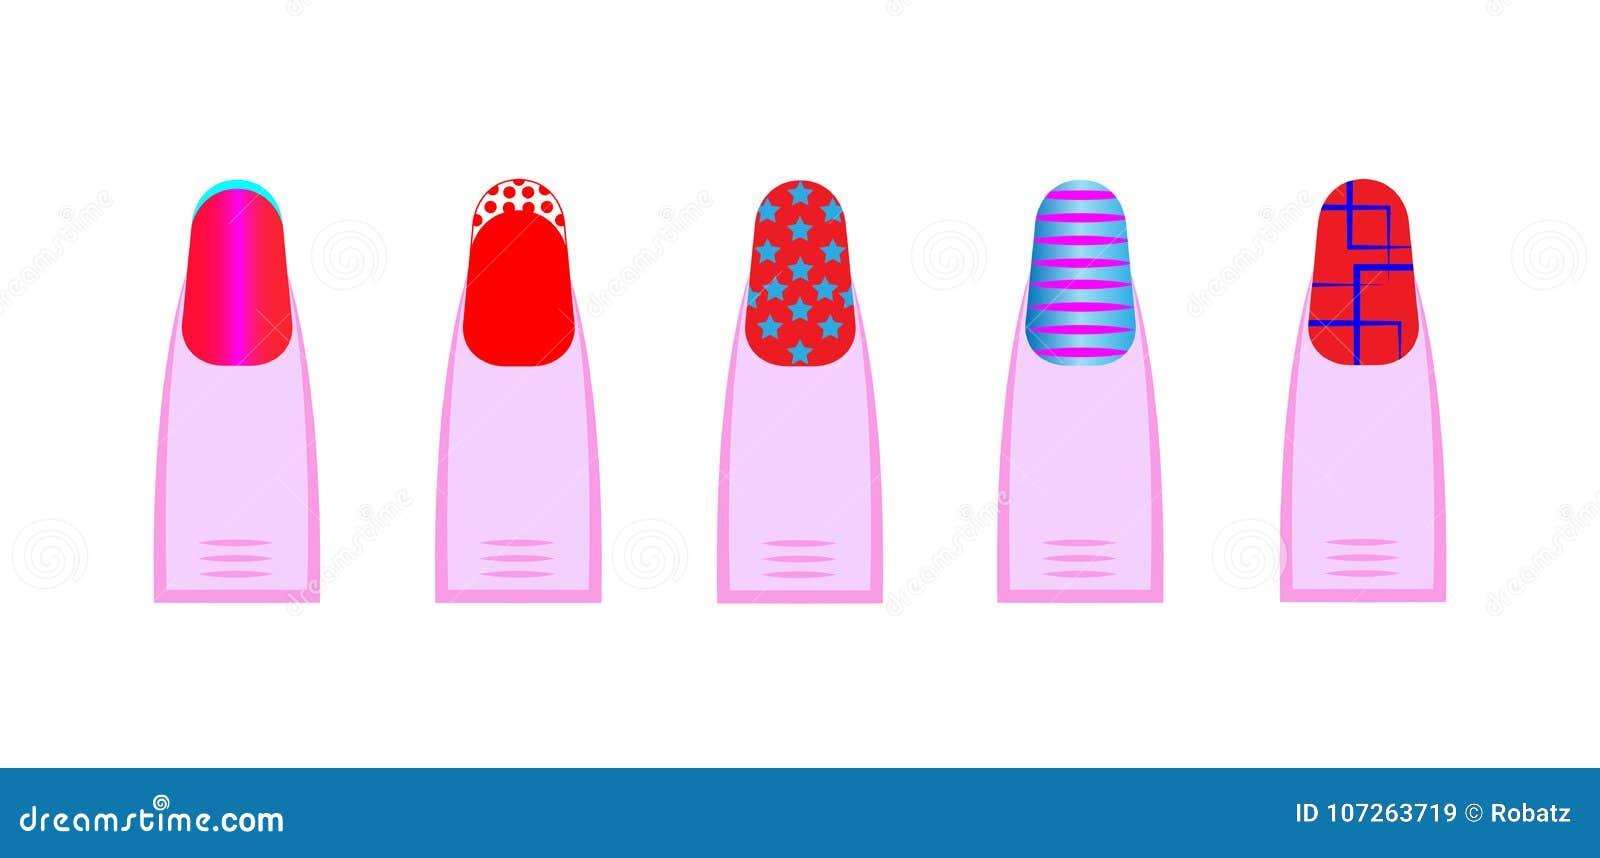 Female gel manicure, Vector set of different nails shape, manicure style. Beauty spa salon illustration with colorful fingernails